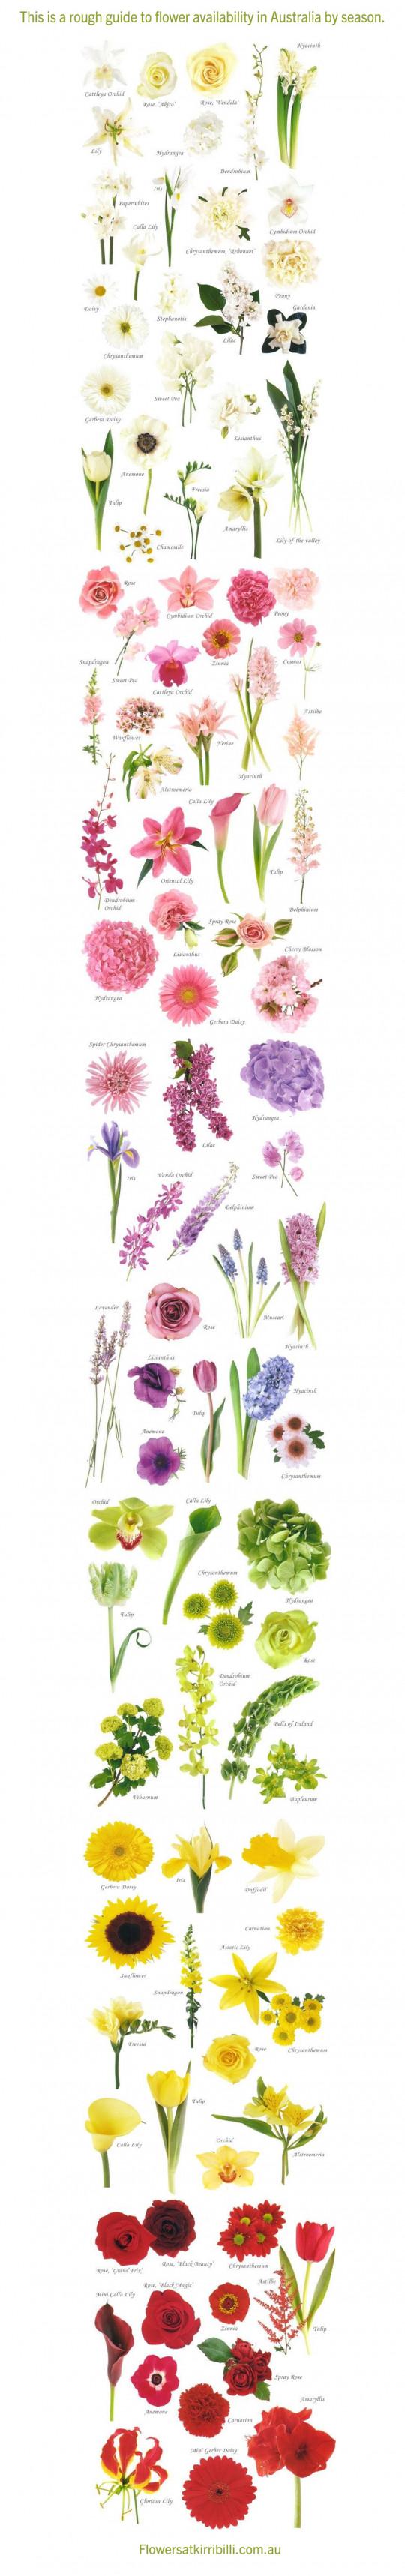 Seasonal flowers in Australia- A rough Guide!